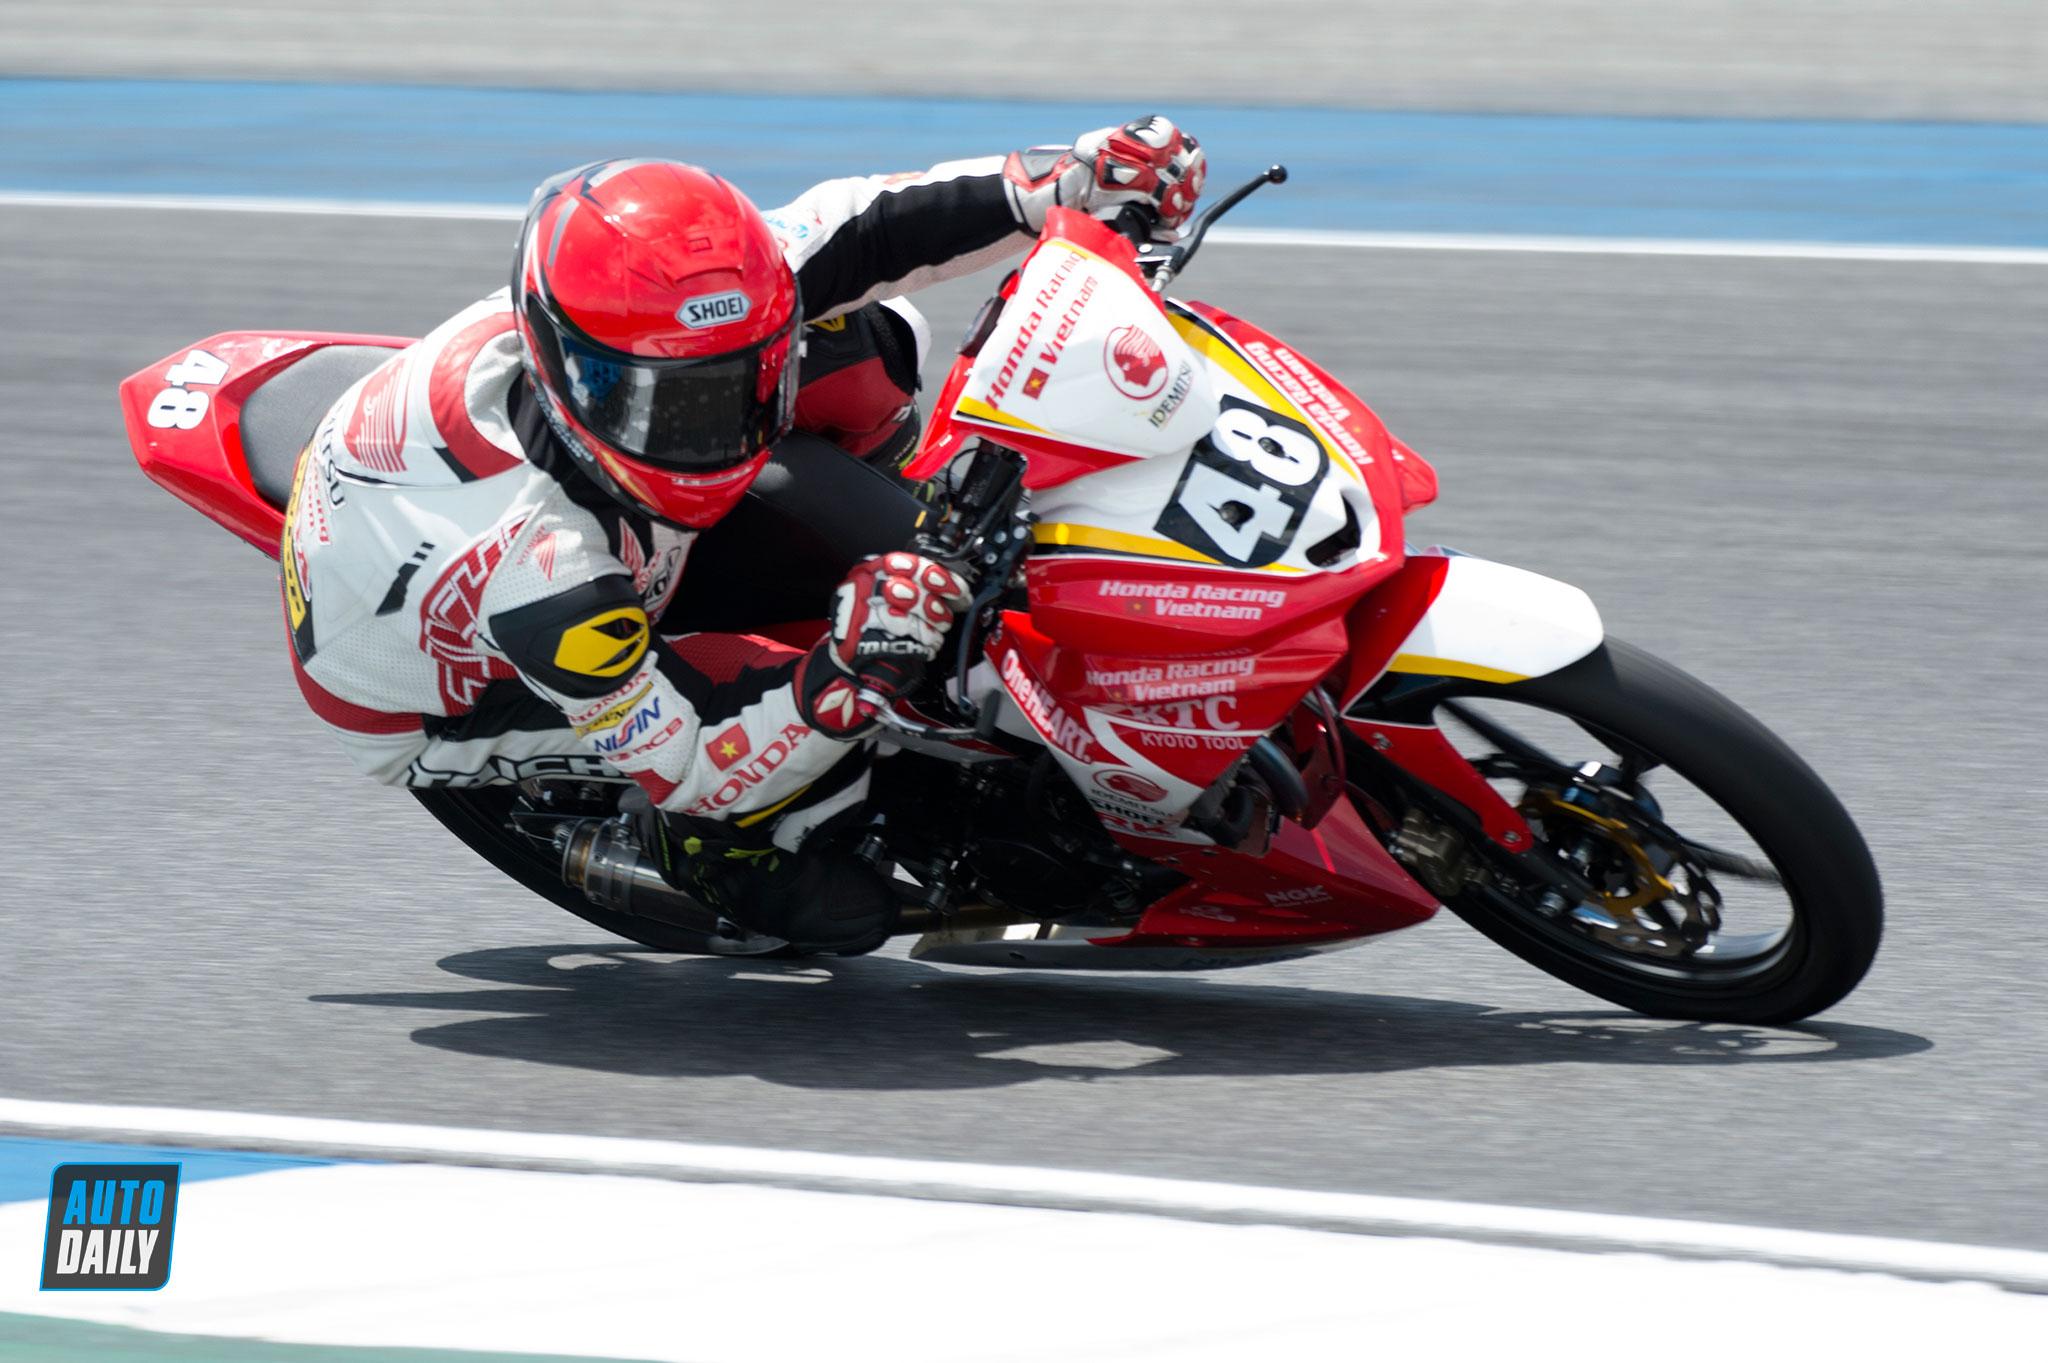 arrc-2019-round3-race1-015-1.jpg